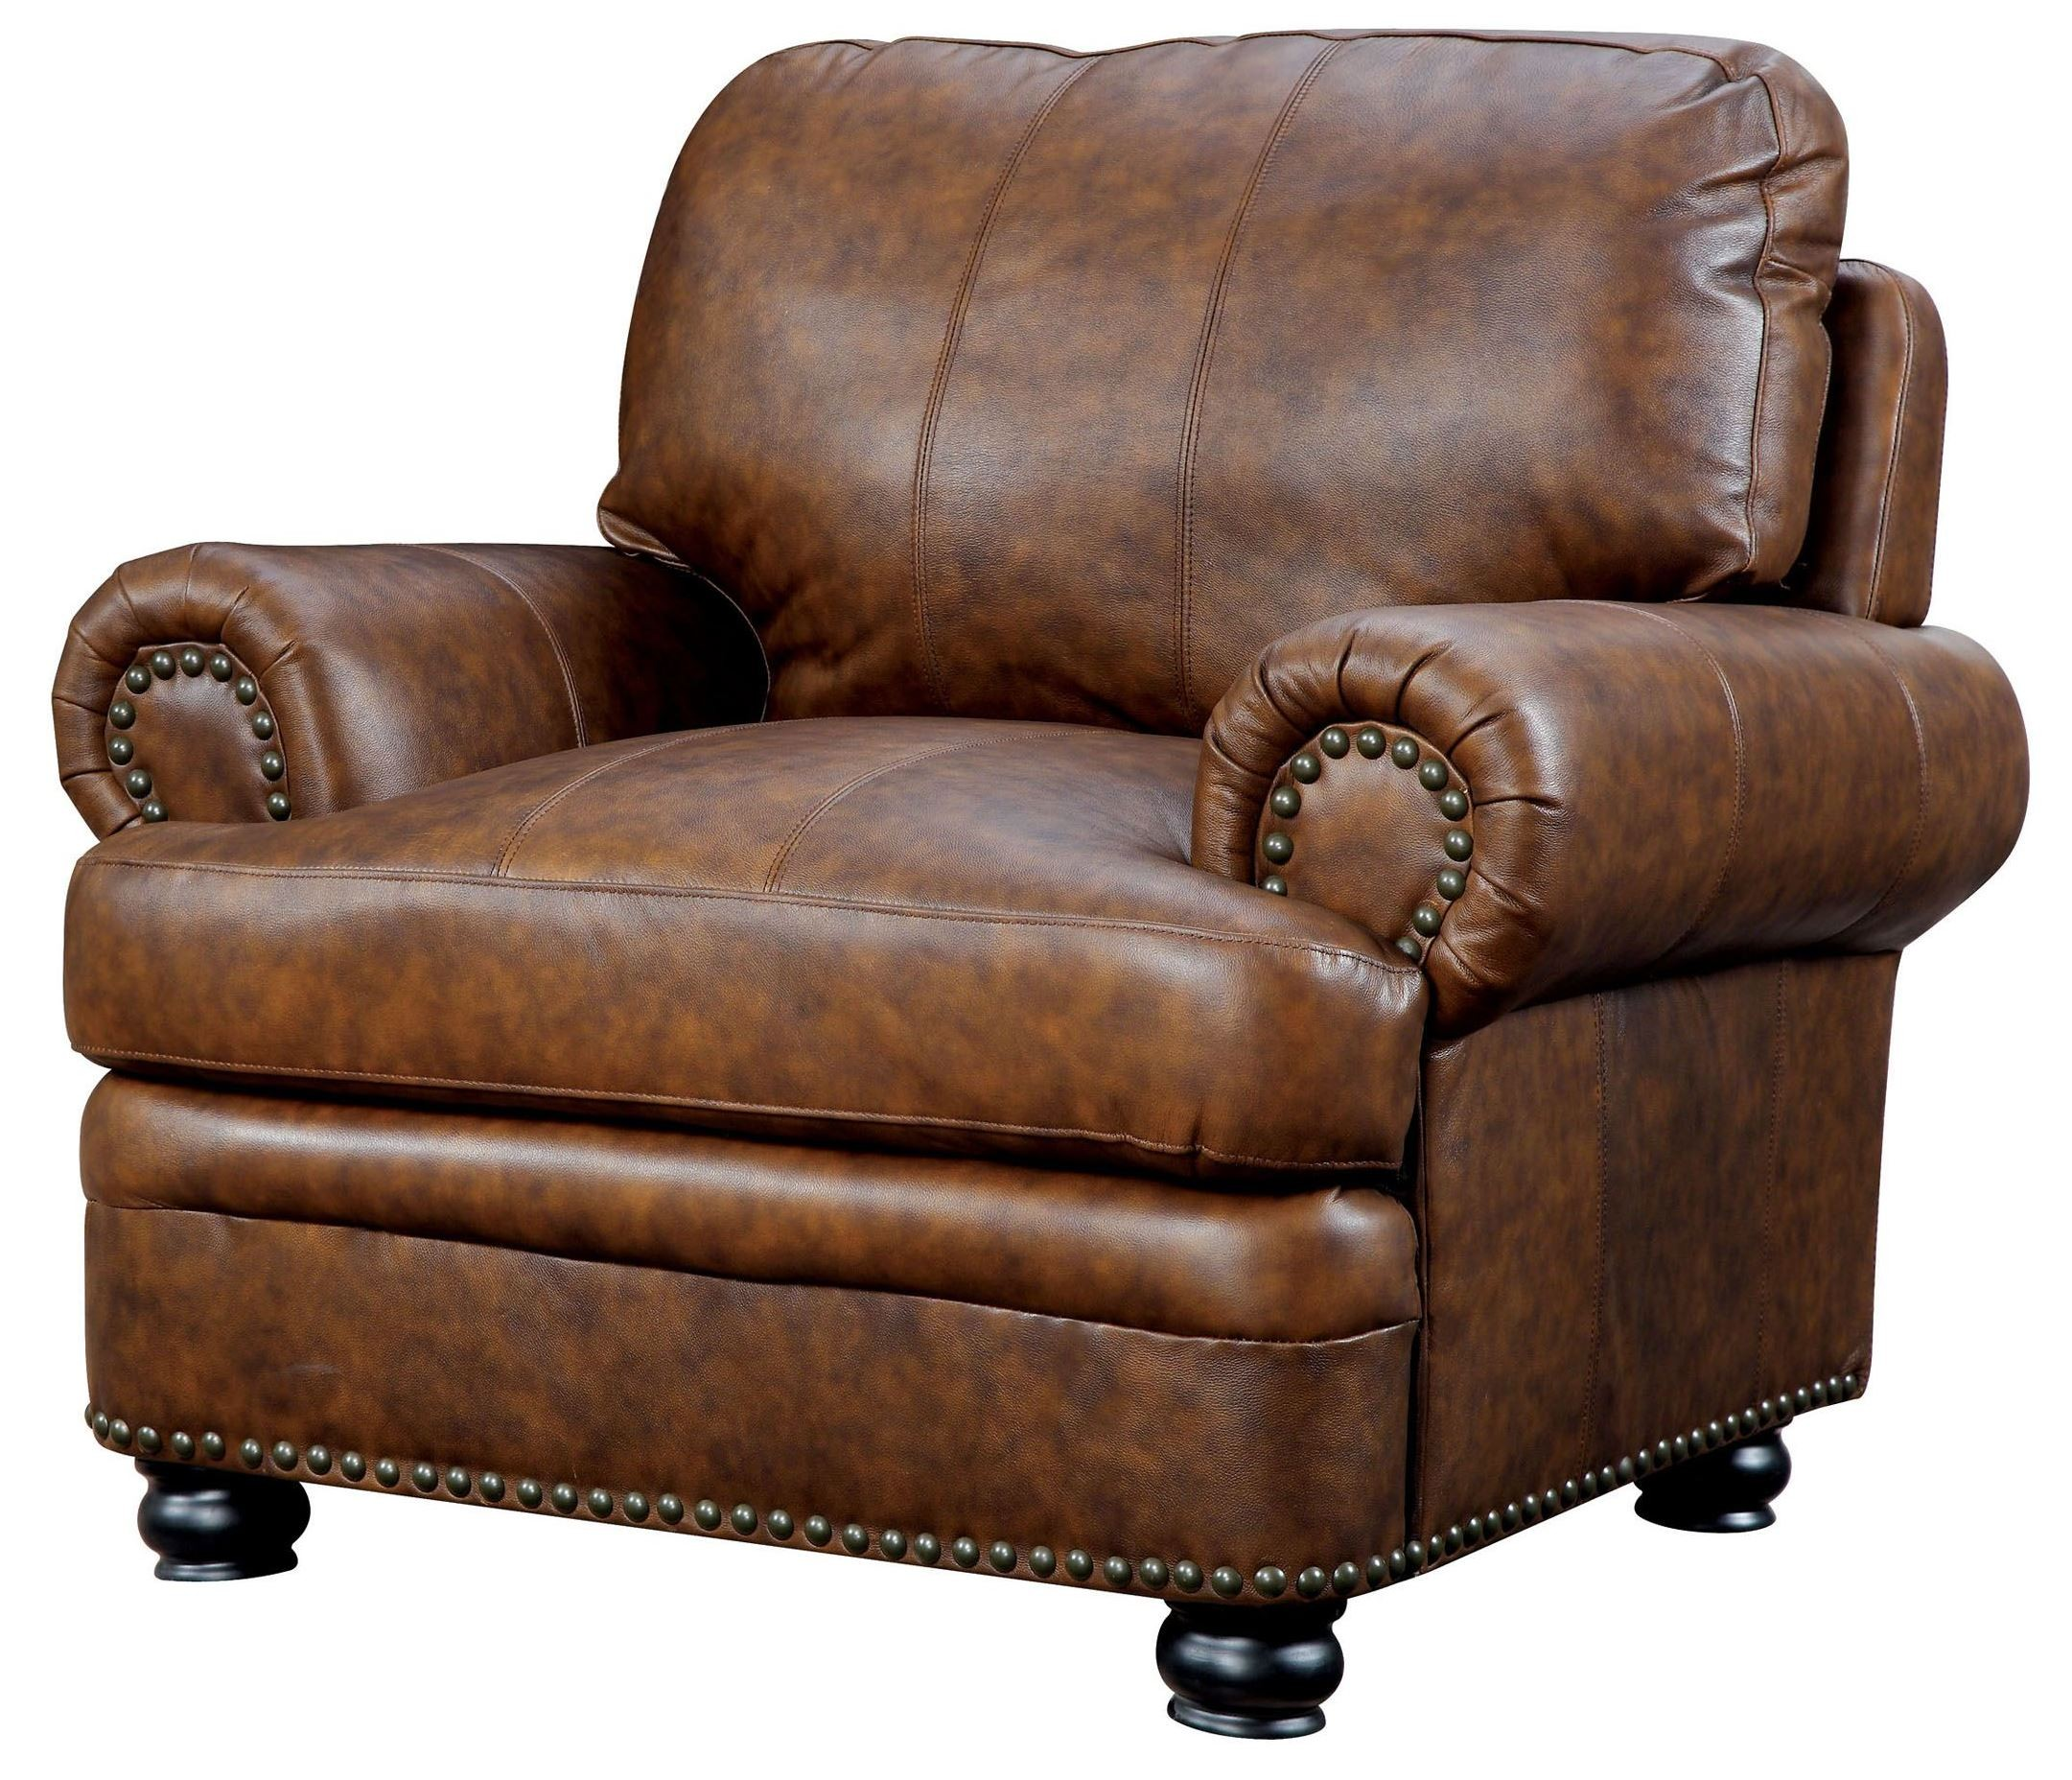 Leather Living Room Set Clearance: Rheinhardt Top Grain Leather Living Room Set From